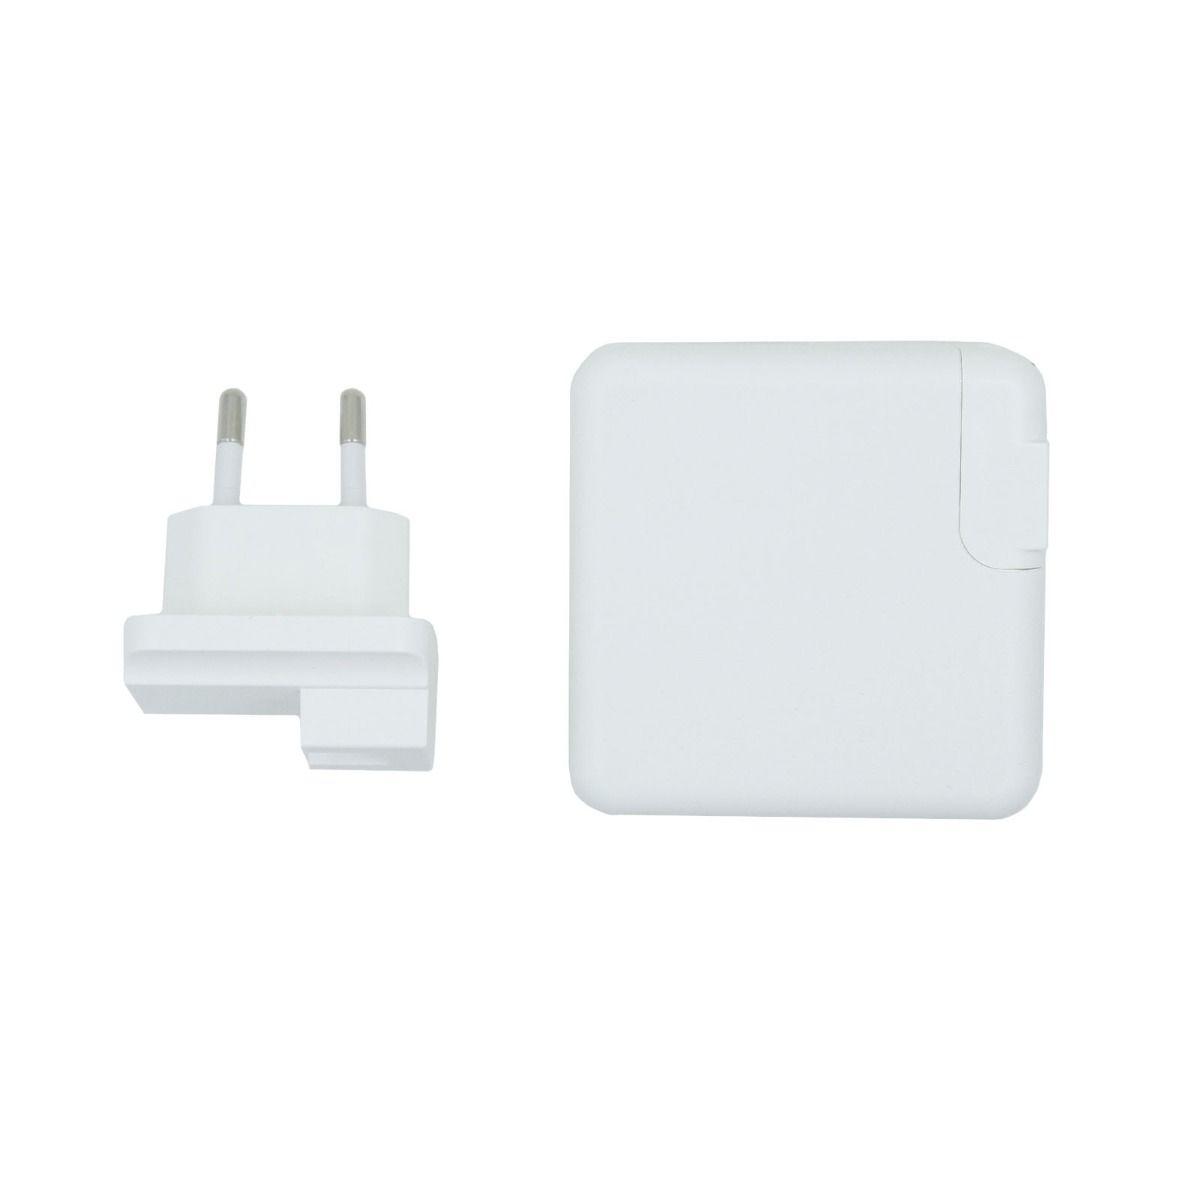 USB C Universell Snabbladdare 60W Adapter